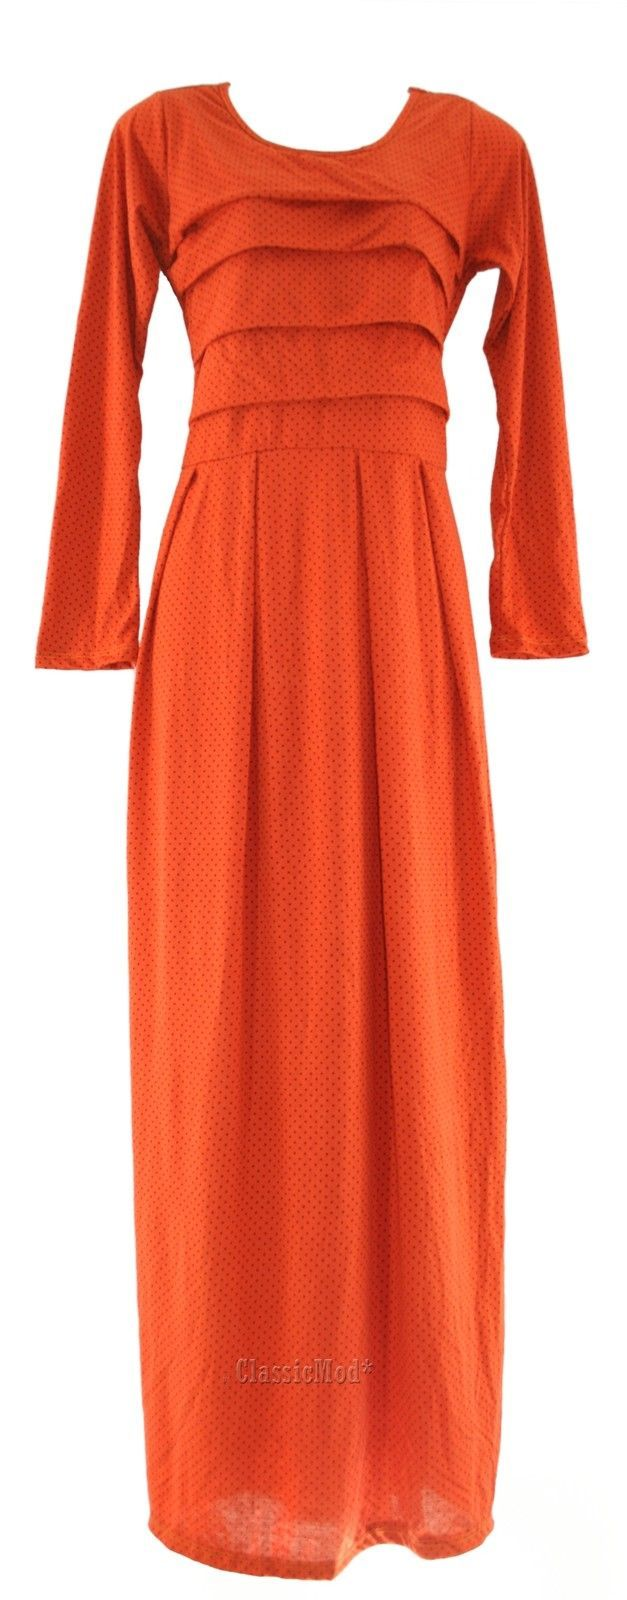 Women ladies long sleeves polka dot modern muslimah maxi dress xs s